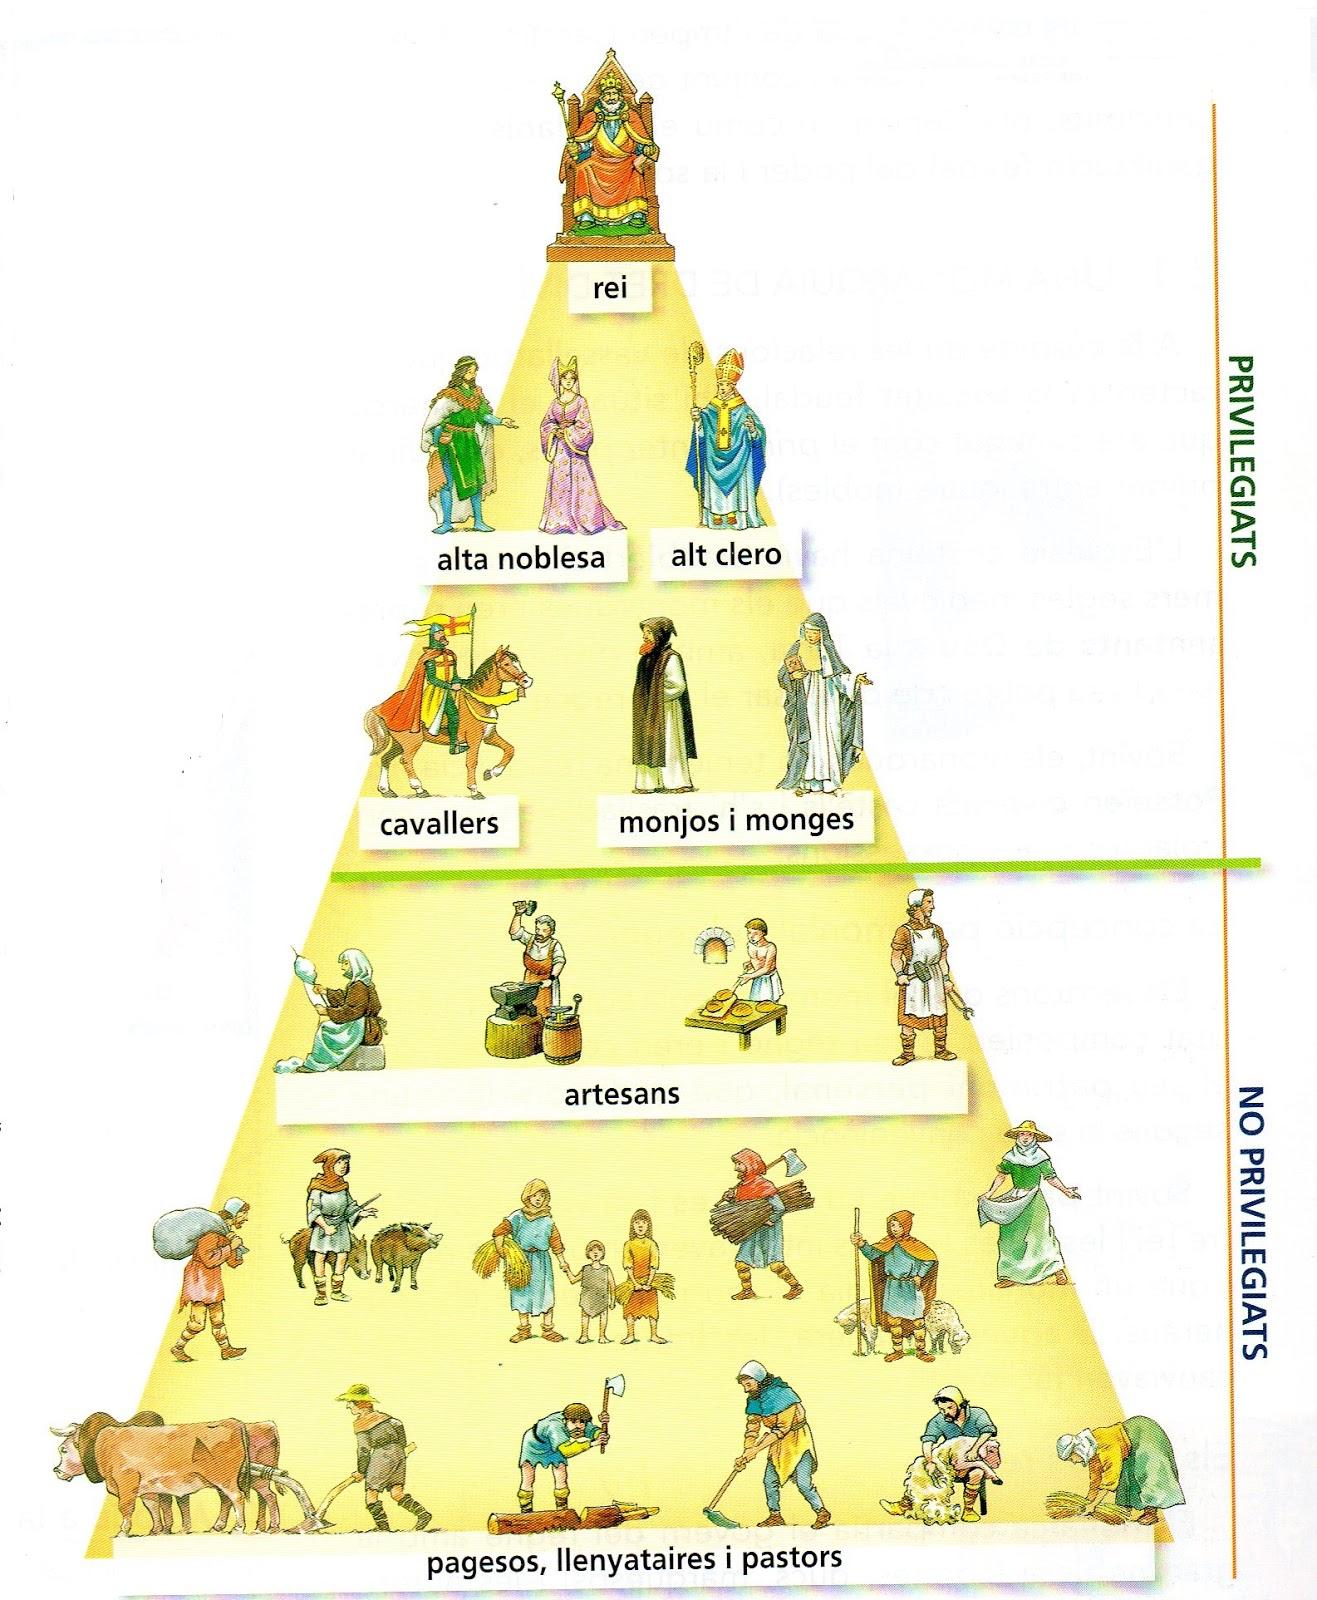 AAR PERISNO Piramide-feudal